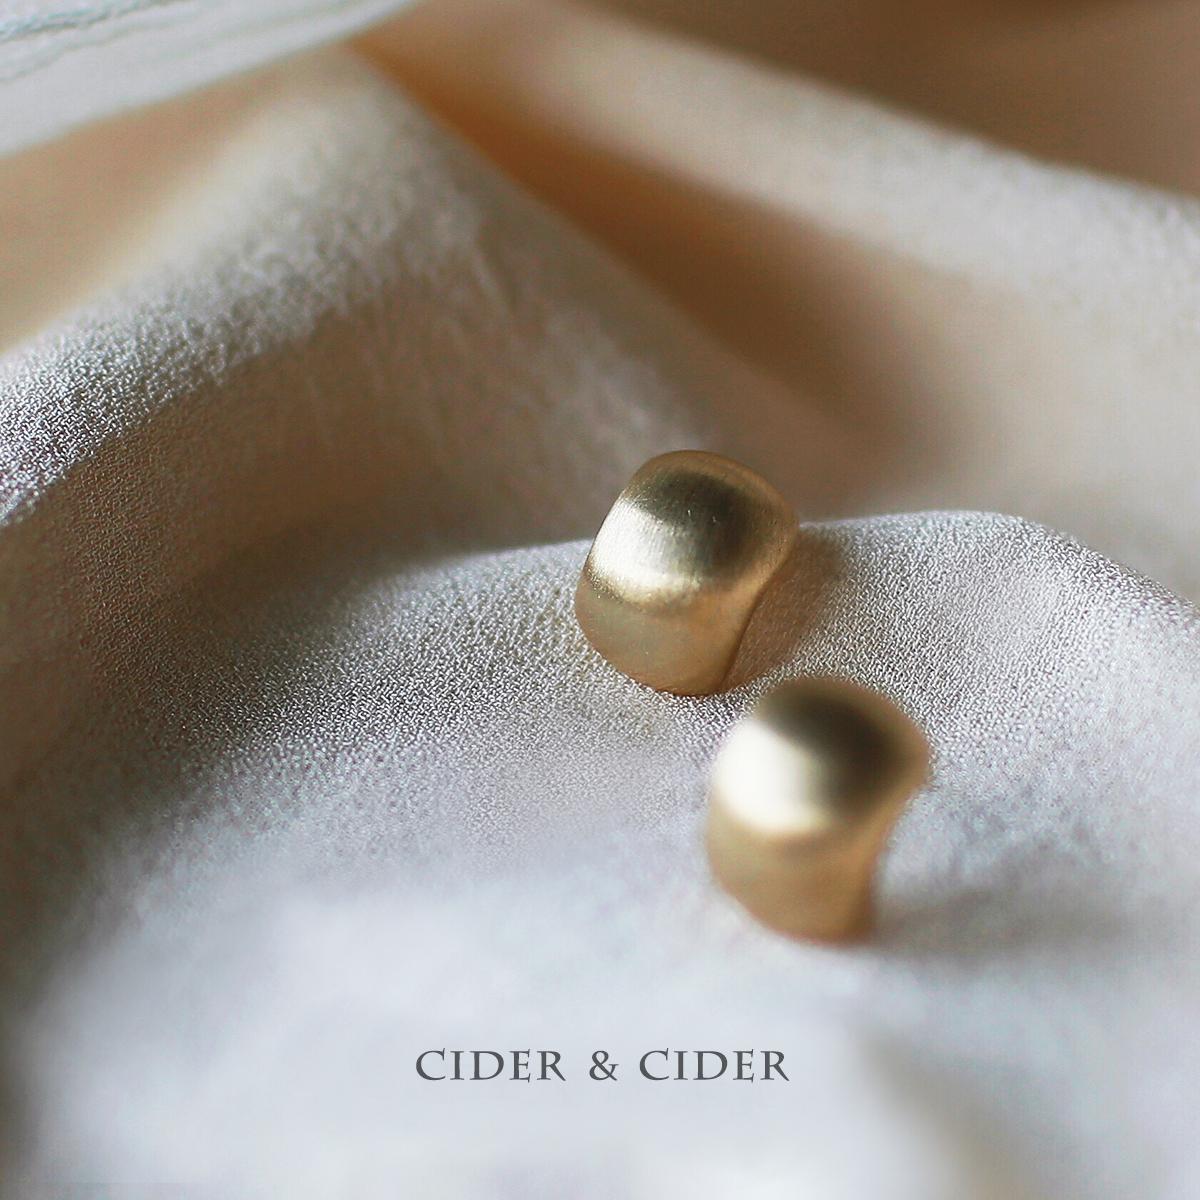 Cider 欧美简约冷淡风拉丝镀金耳钉设计感小众法式耳环金(银色)